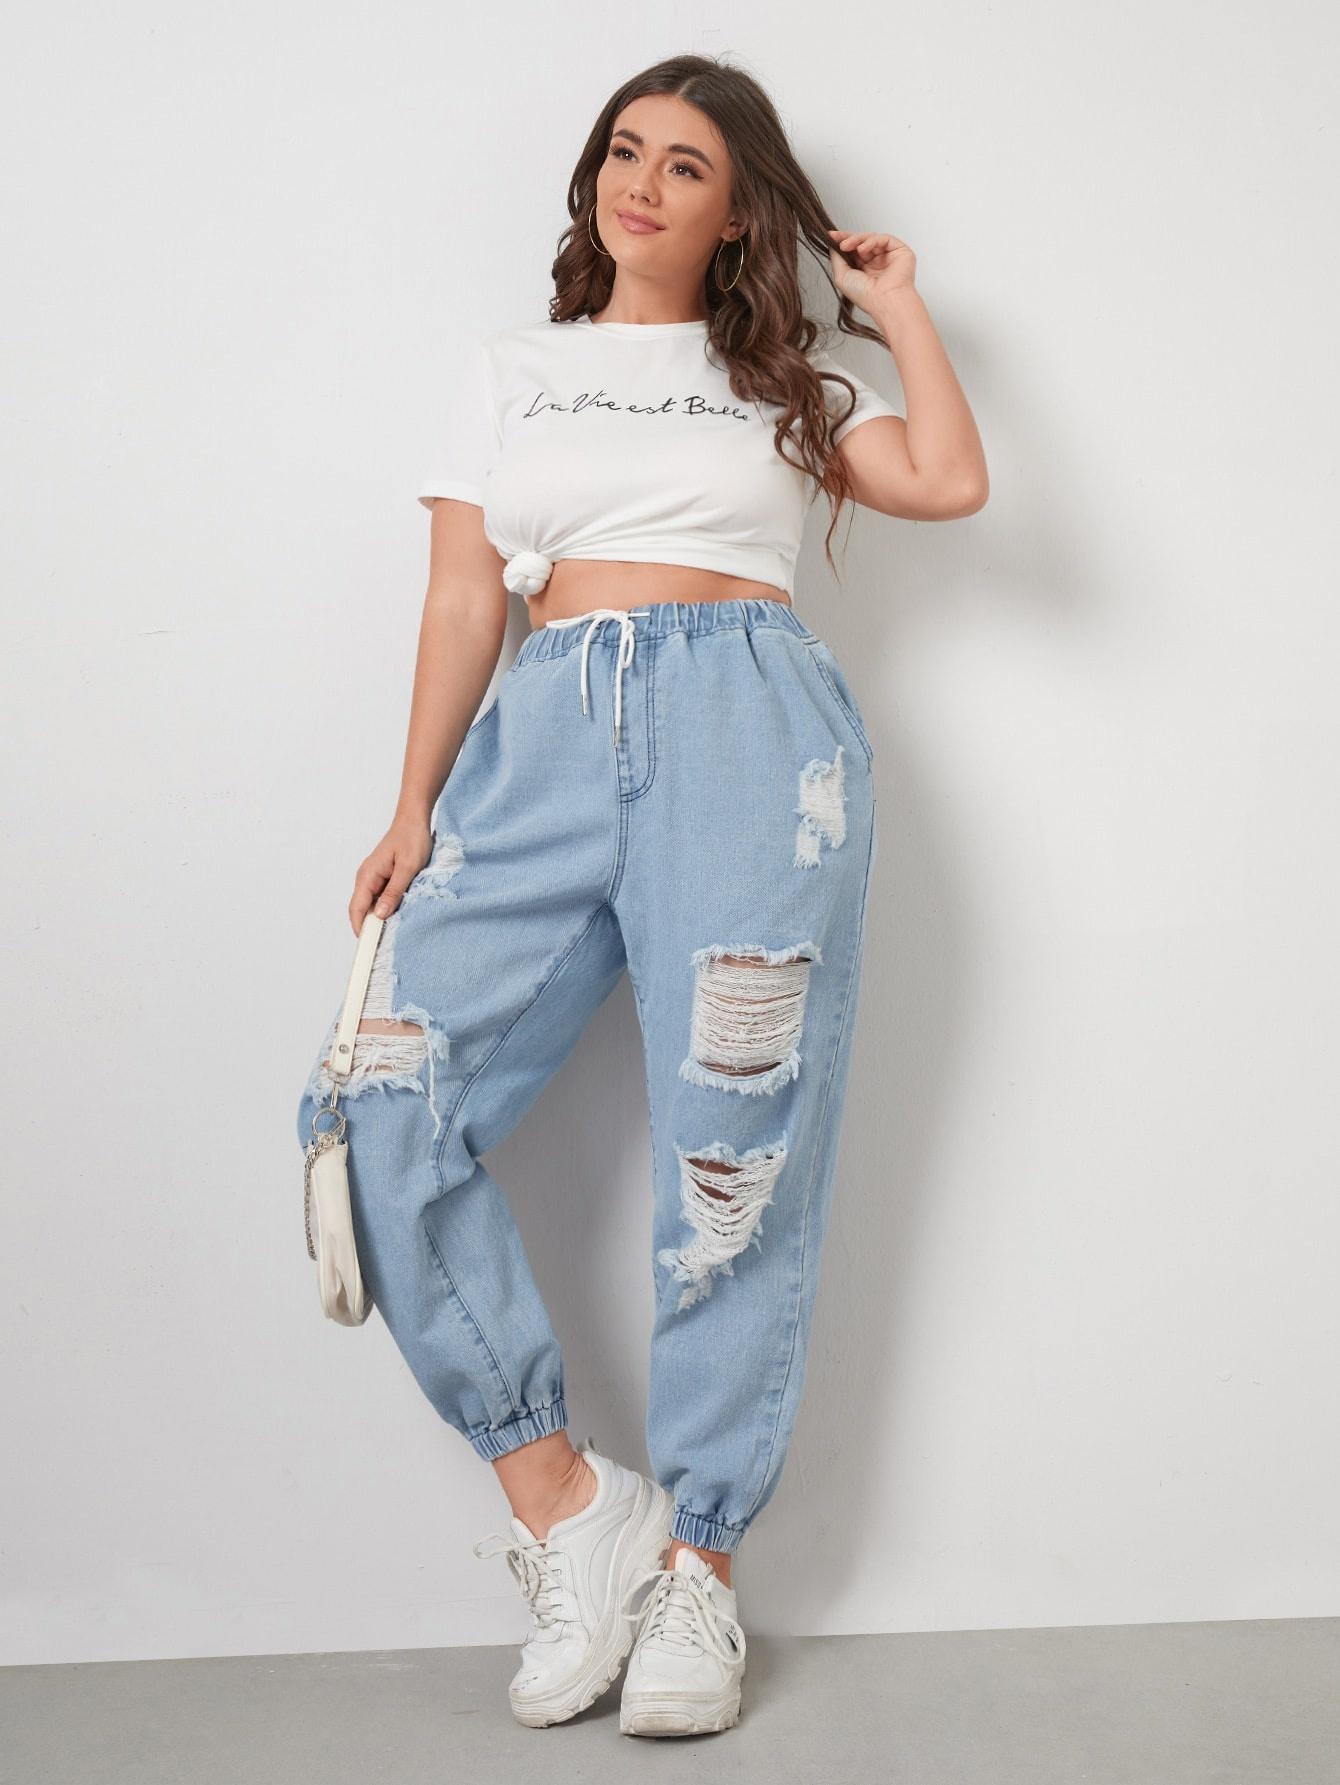 Jeans de mezclilla shein tallas grandes